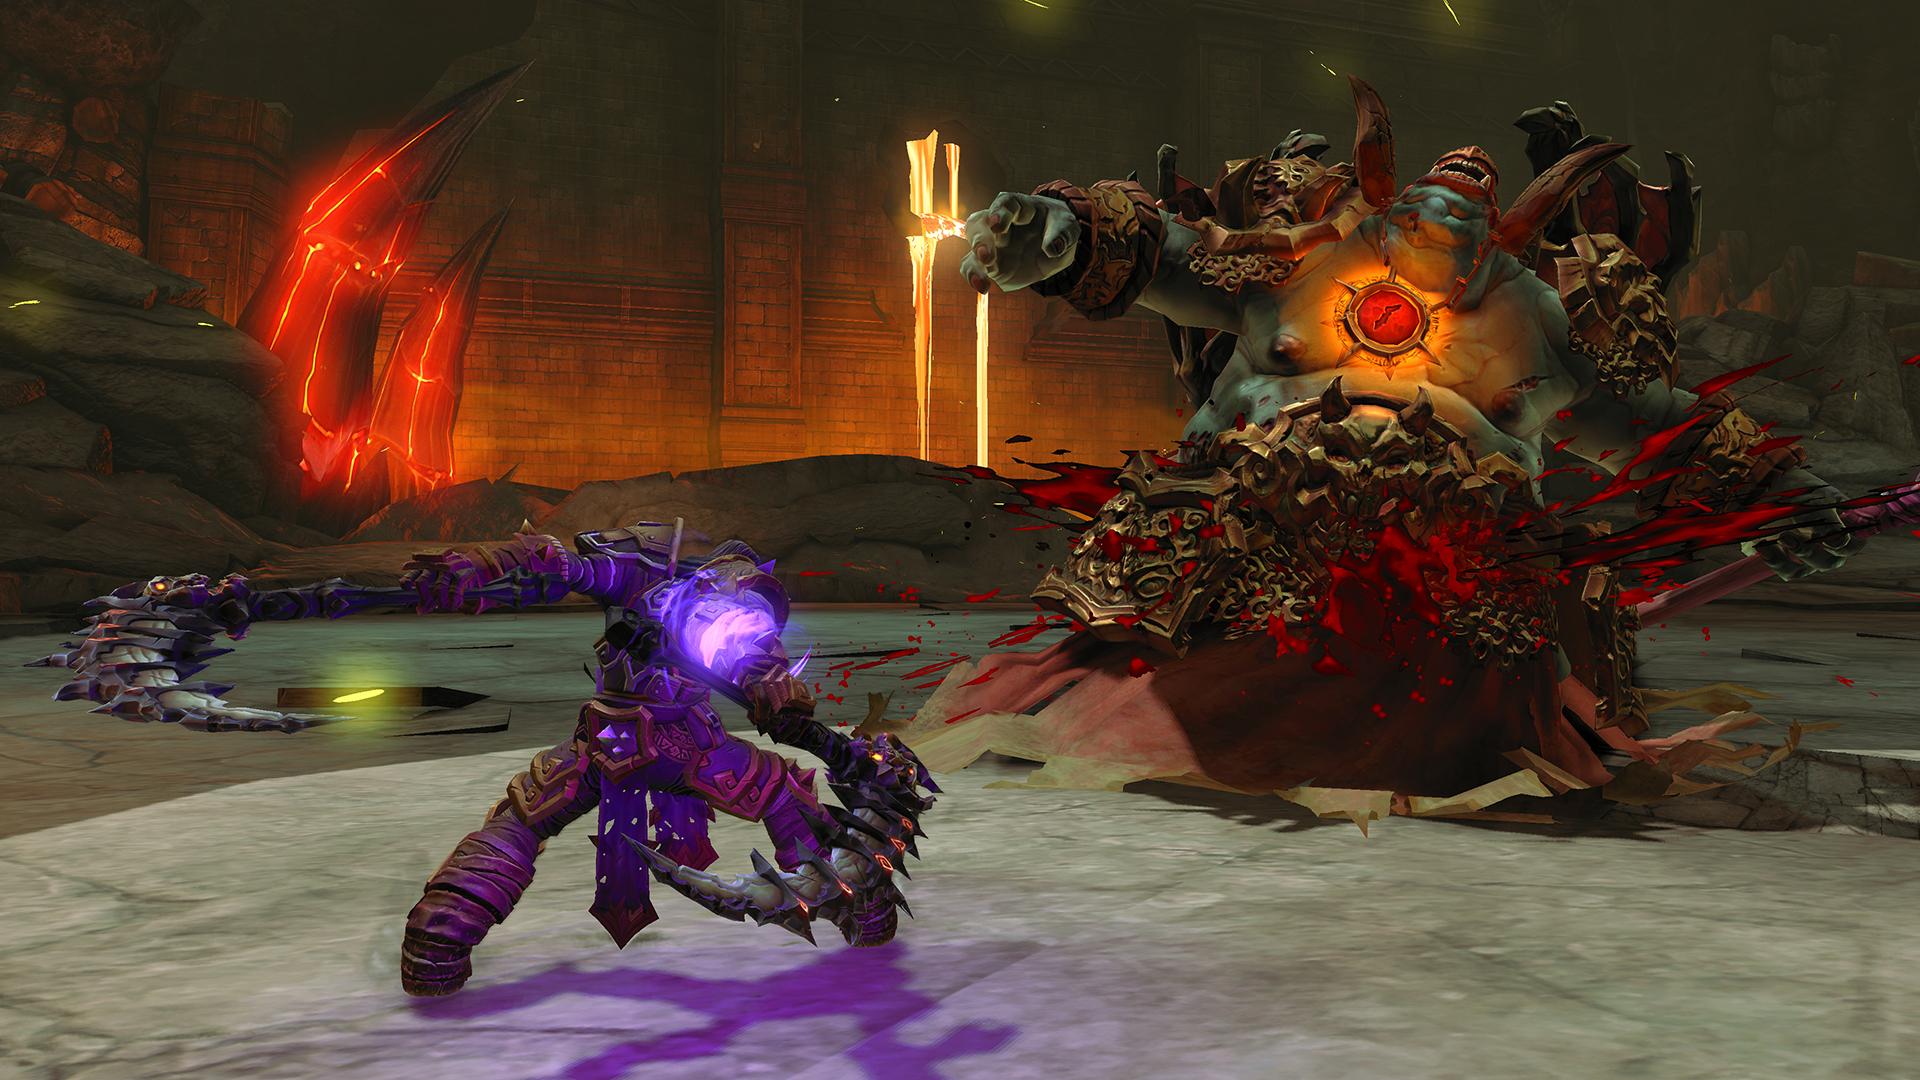 Darksiders II: Deathinitive Edition screenshot 1